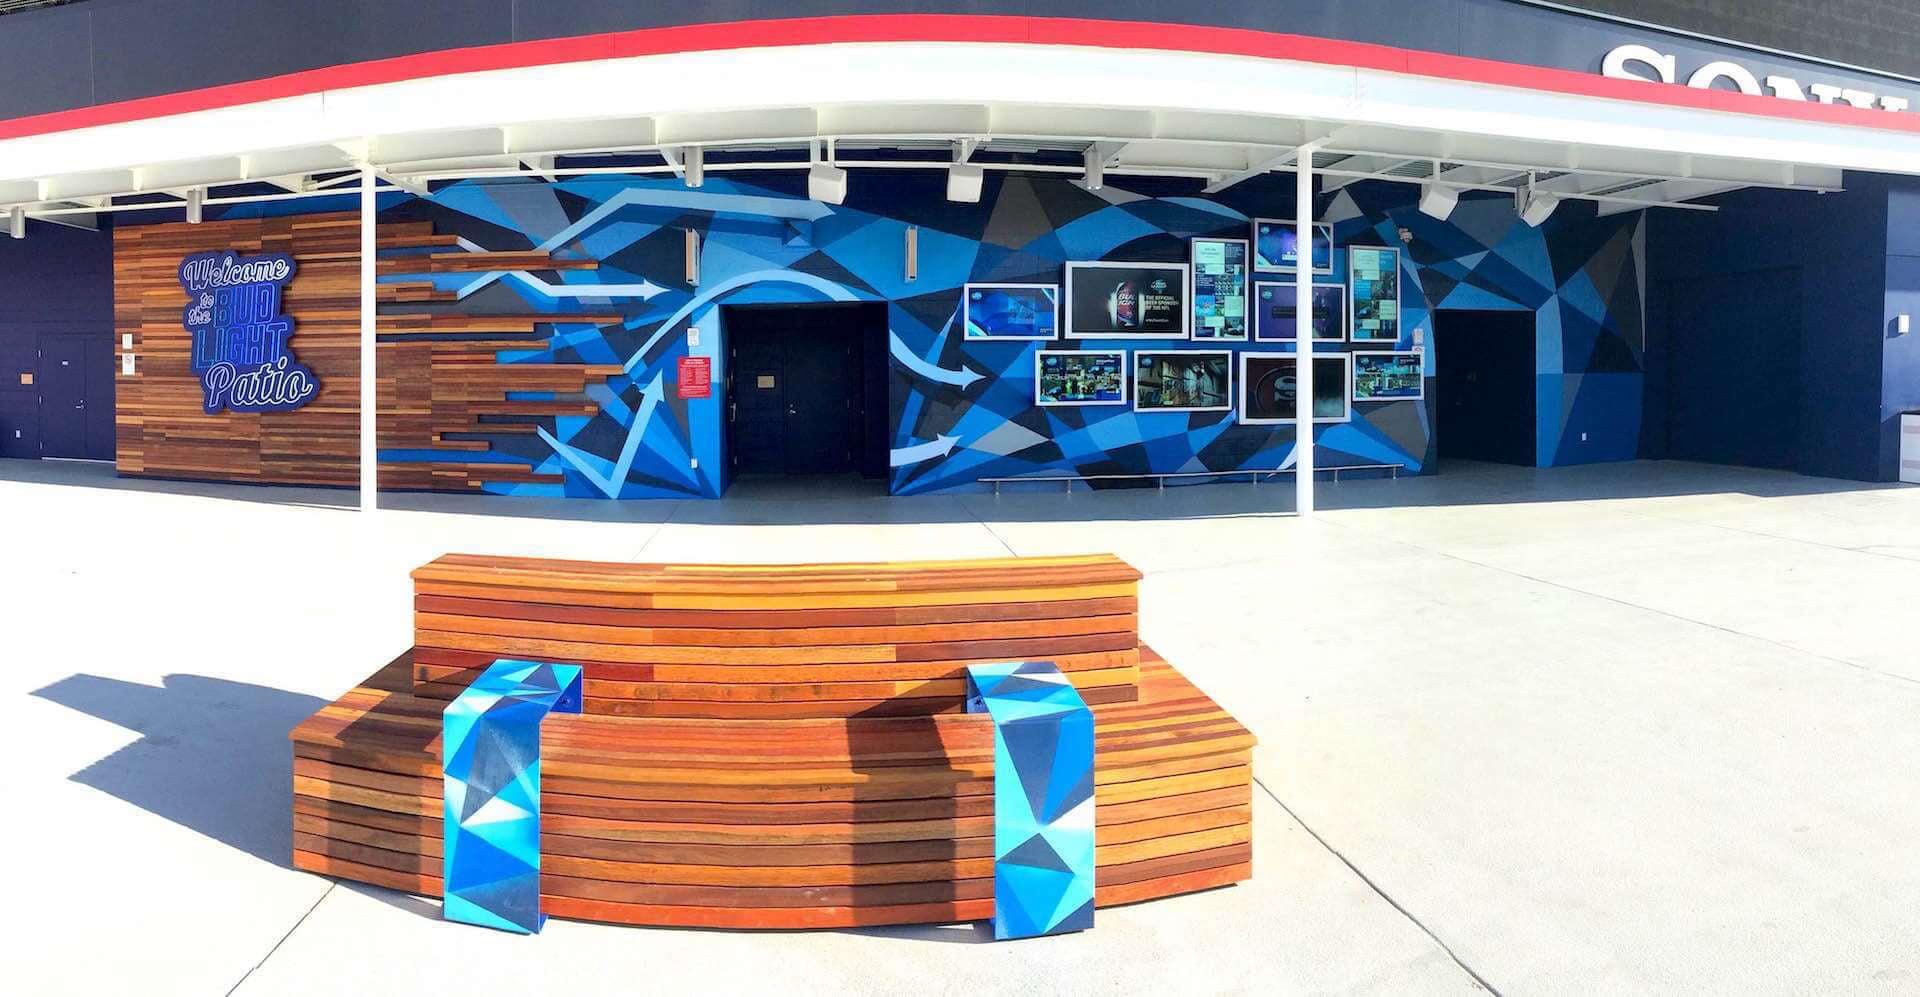 Commissioned Large-scale Mural 2 for GPJ | Levi's Stadium, Santa Clara USA, 2015